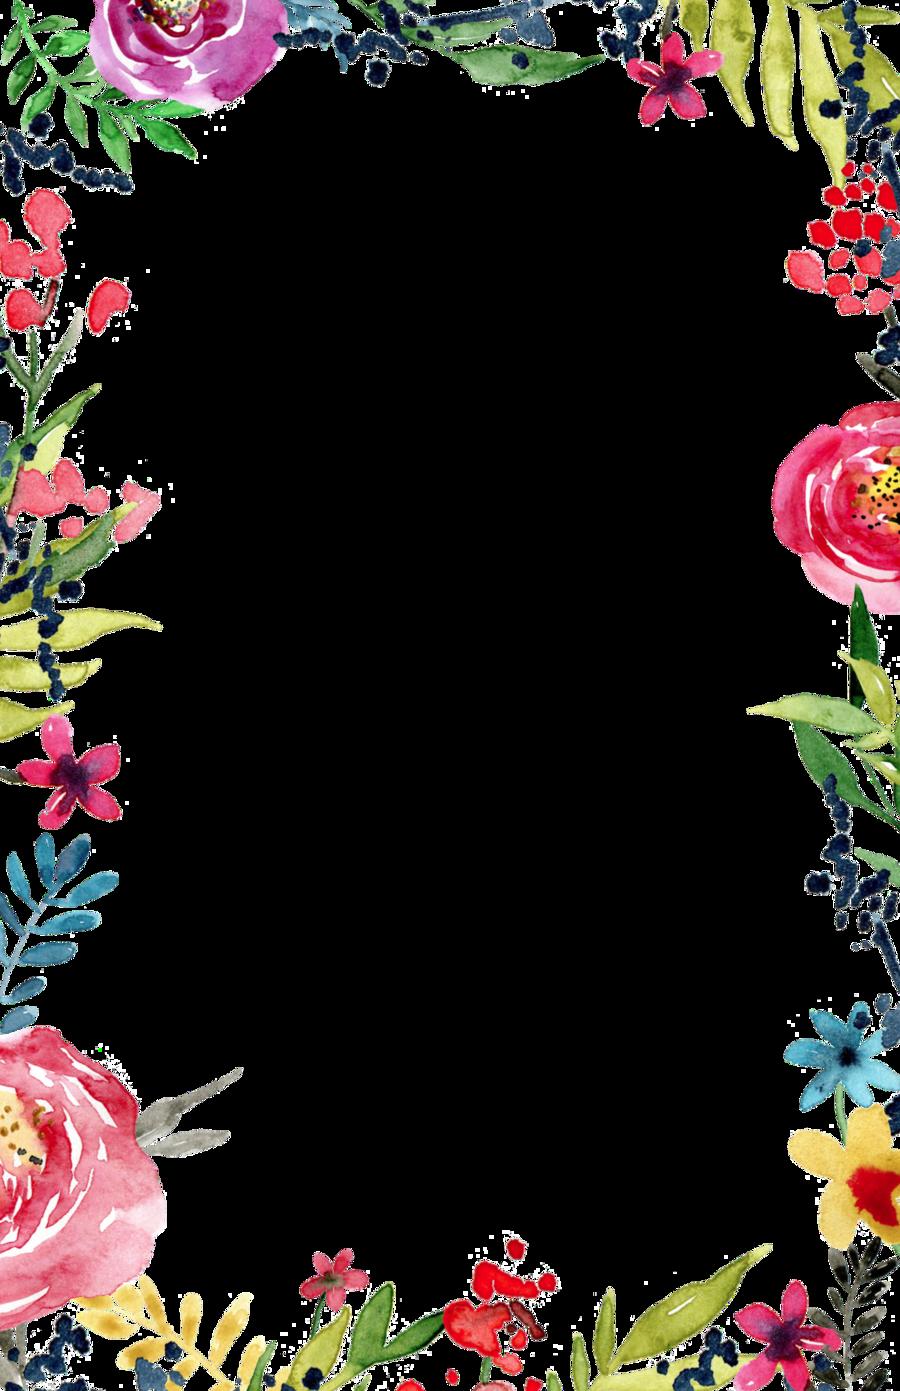 Floral Transparent Background Free